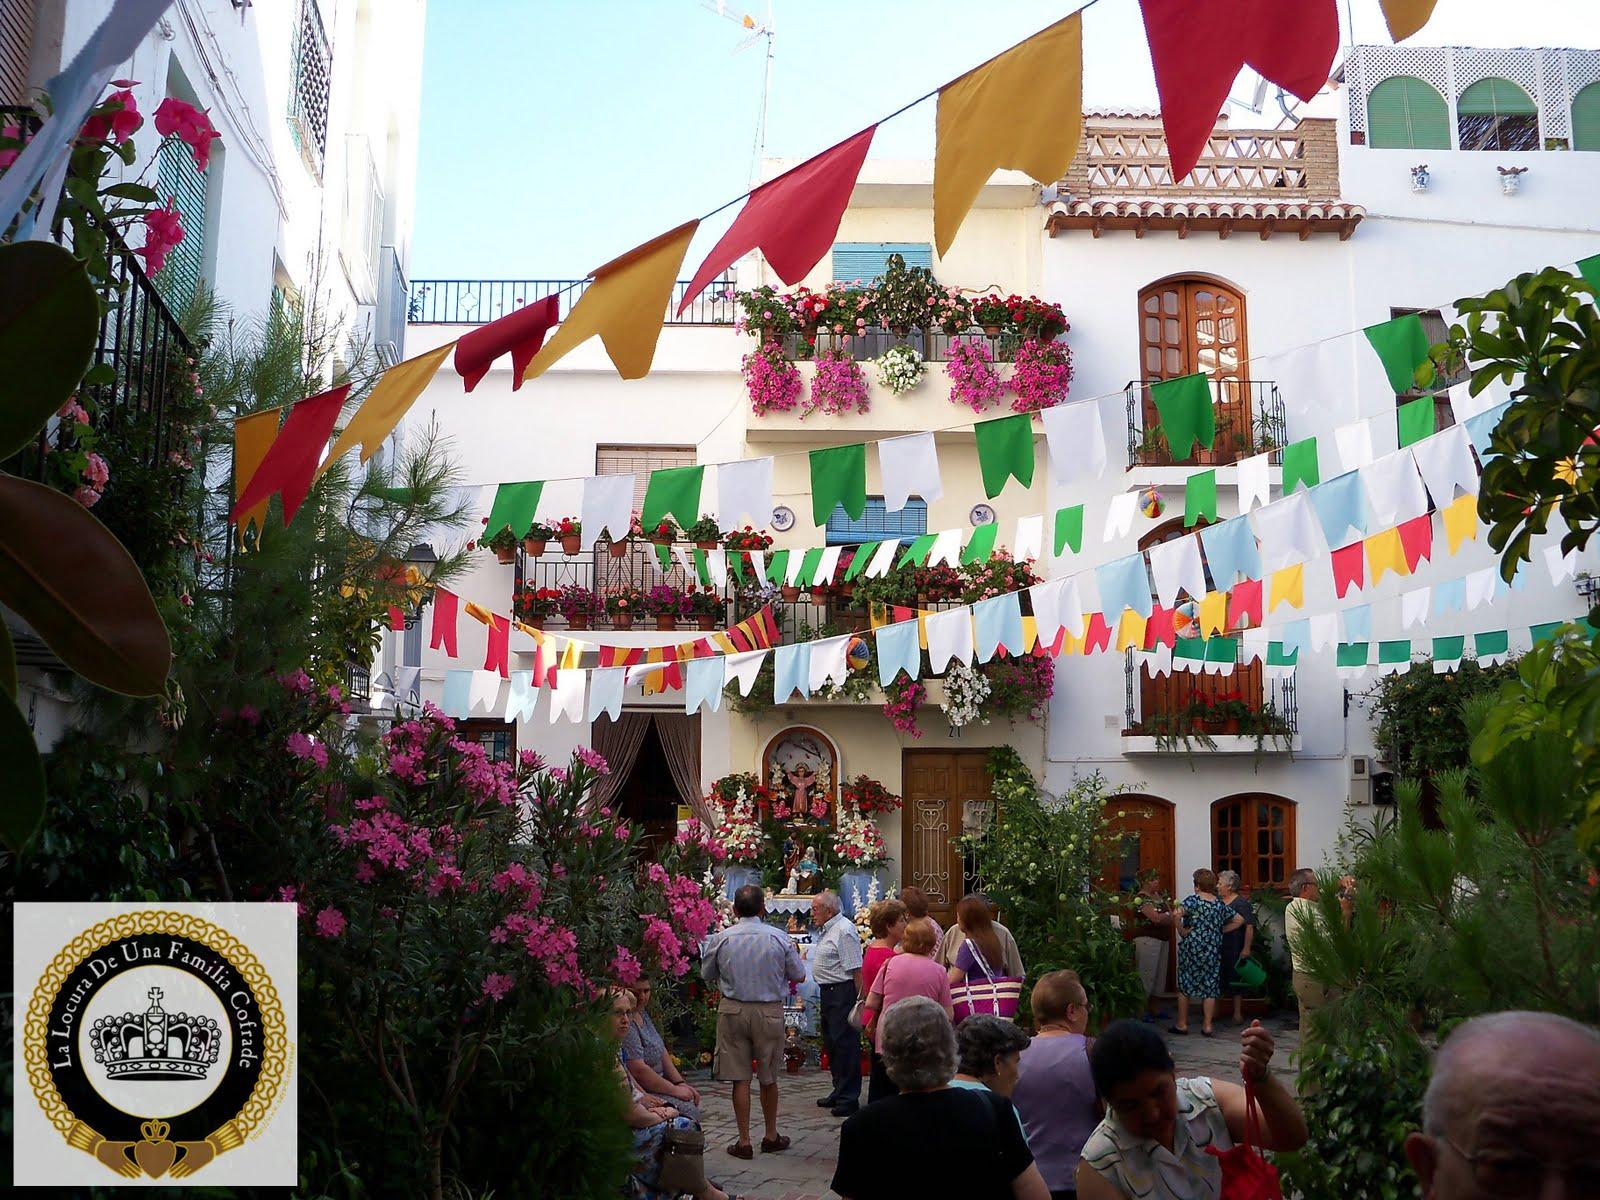 Placeta de Santa Ana